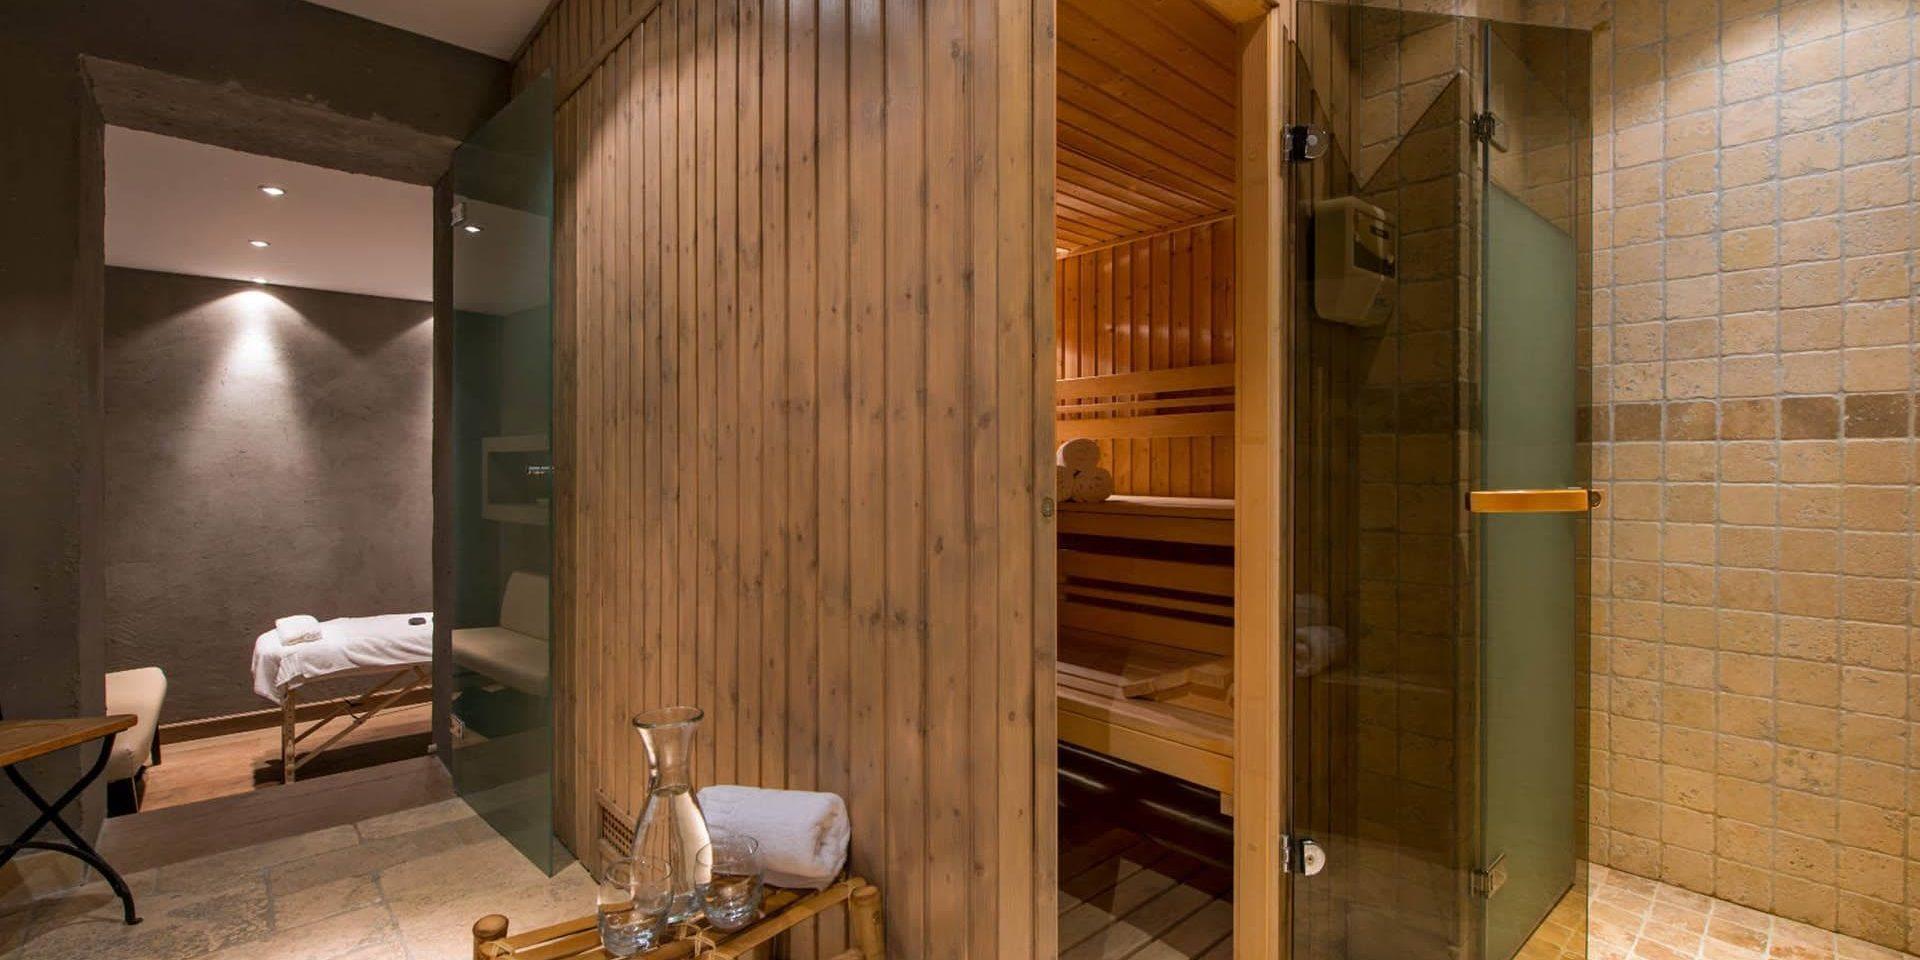 Chalet Pierre Avoi Verbier Les 4 Vallees Zwitserland wintersport skivakantie luxe sauna massageruimte massagetafel hout handdoek karaf ontspannen relaxen genieten